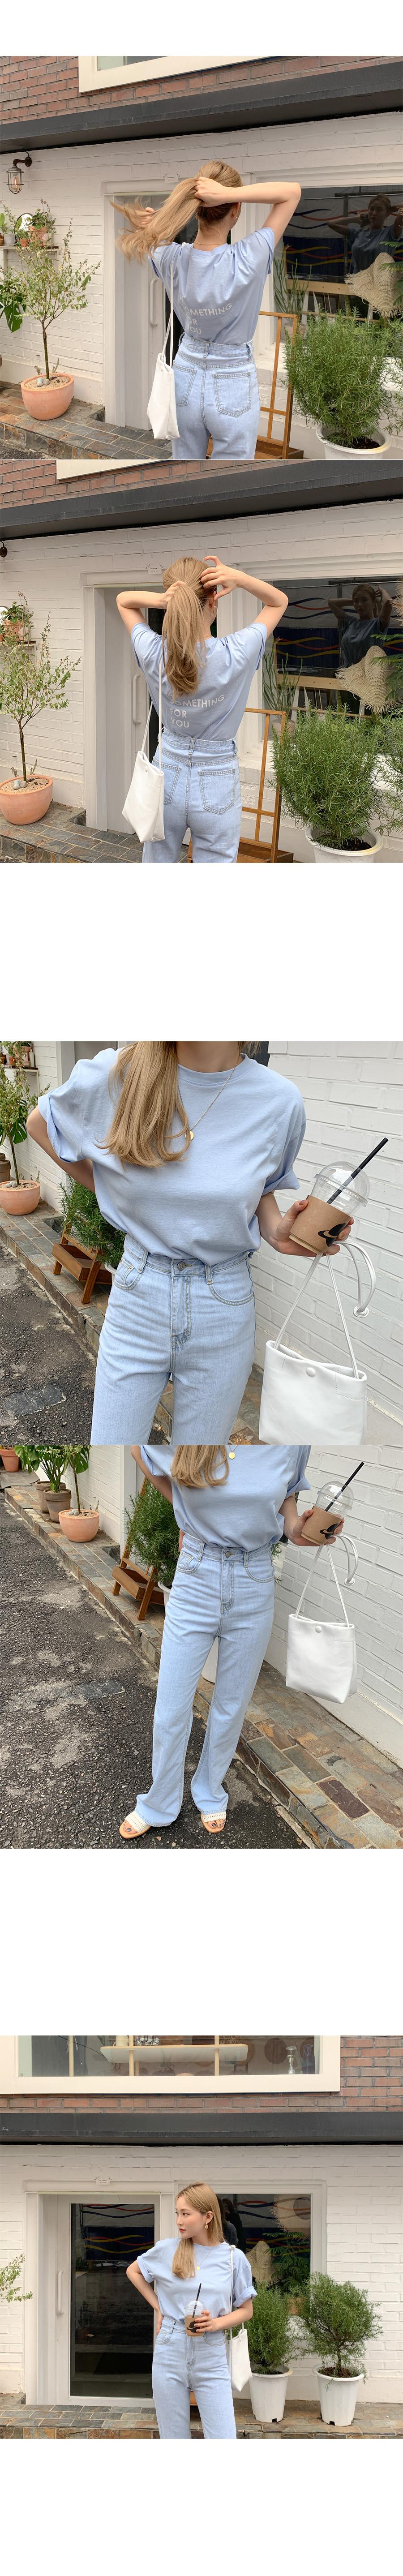 Mousse Lettering Cotton Short Sleeve Tee